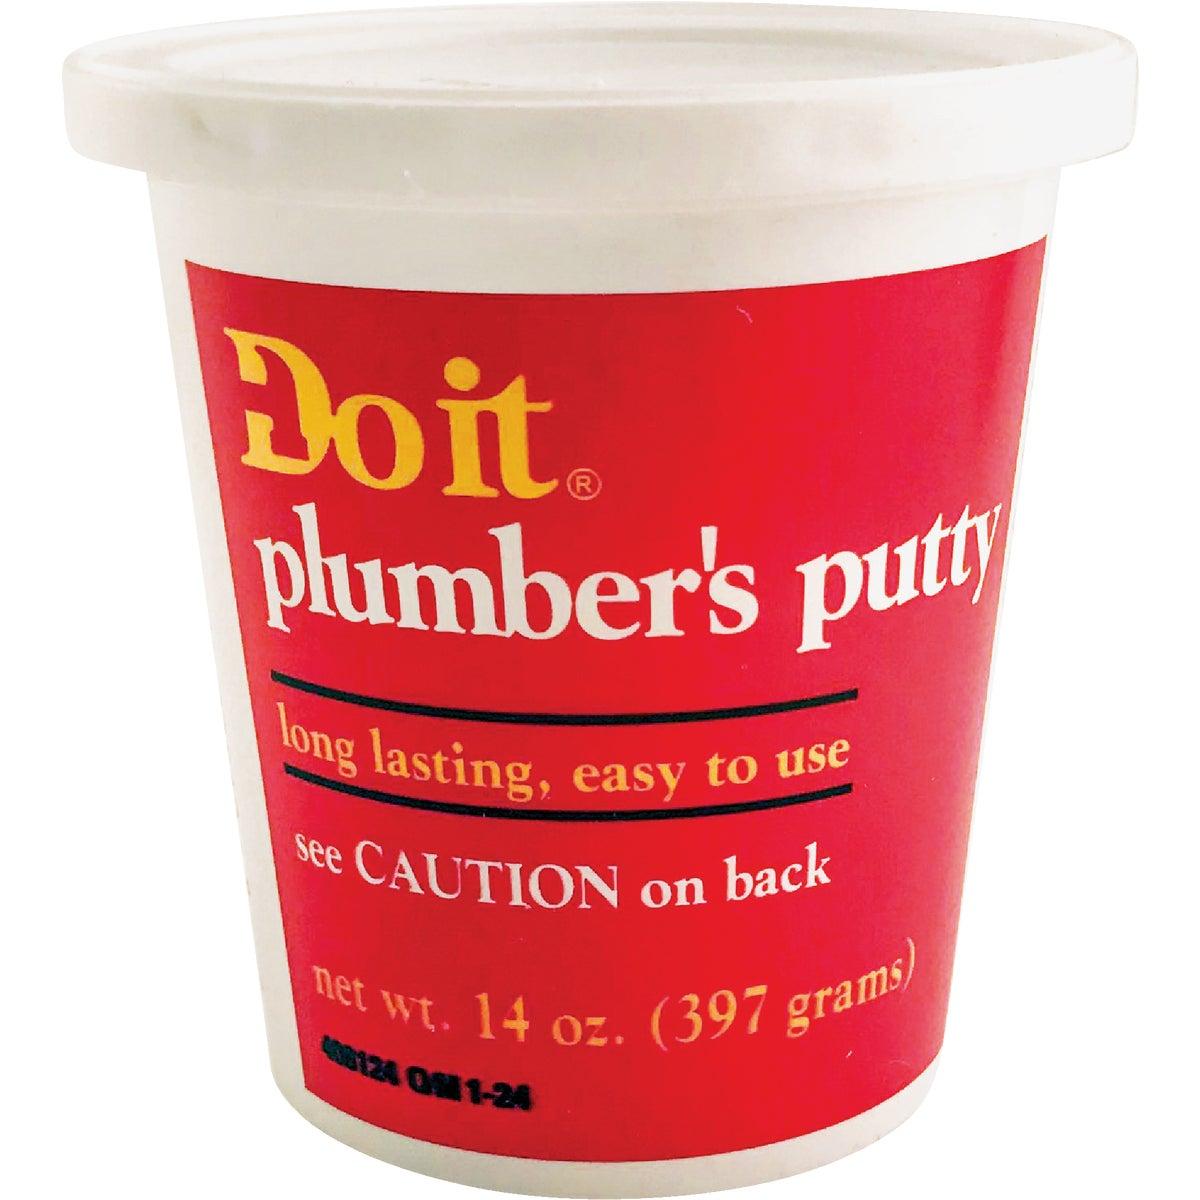 14OZ PLUMBERS PUTTY